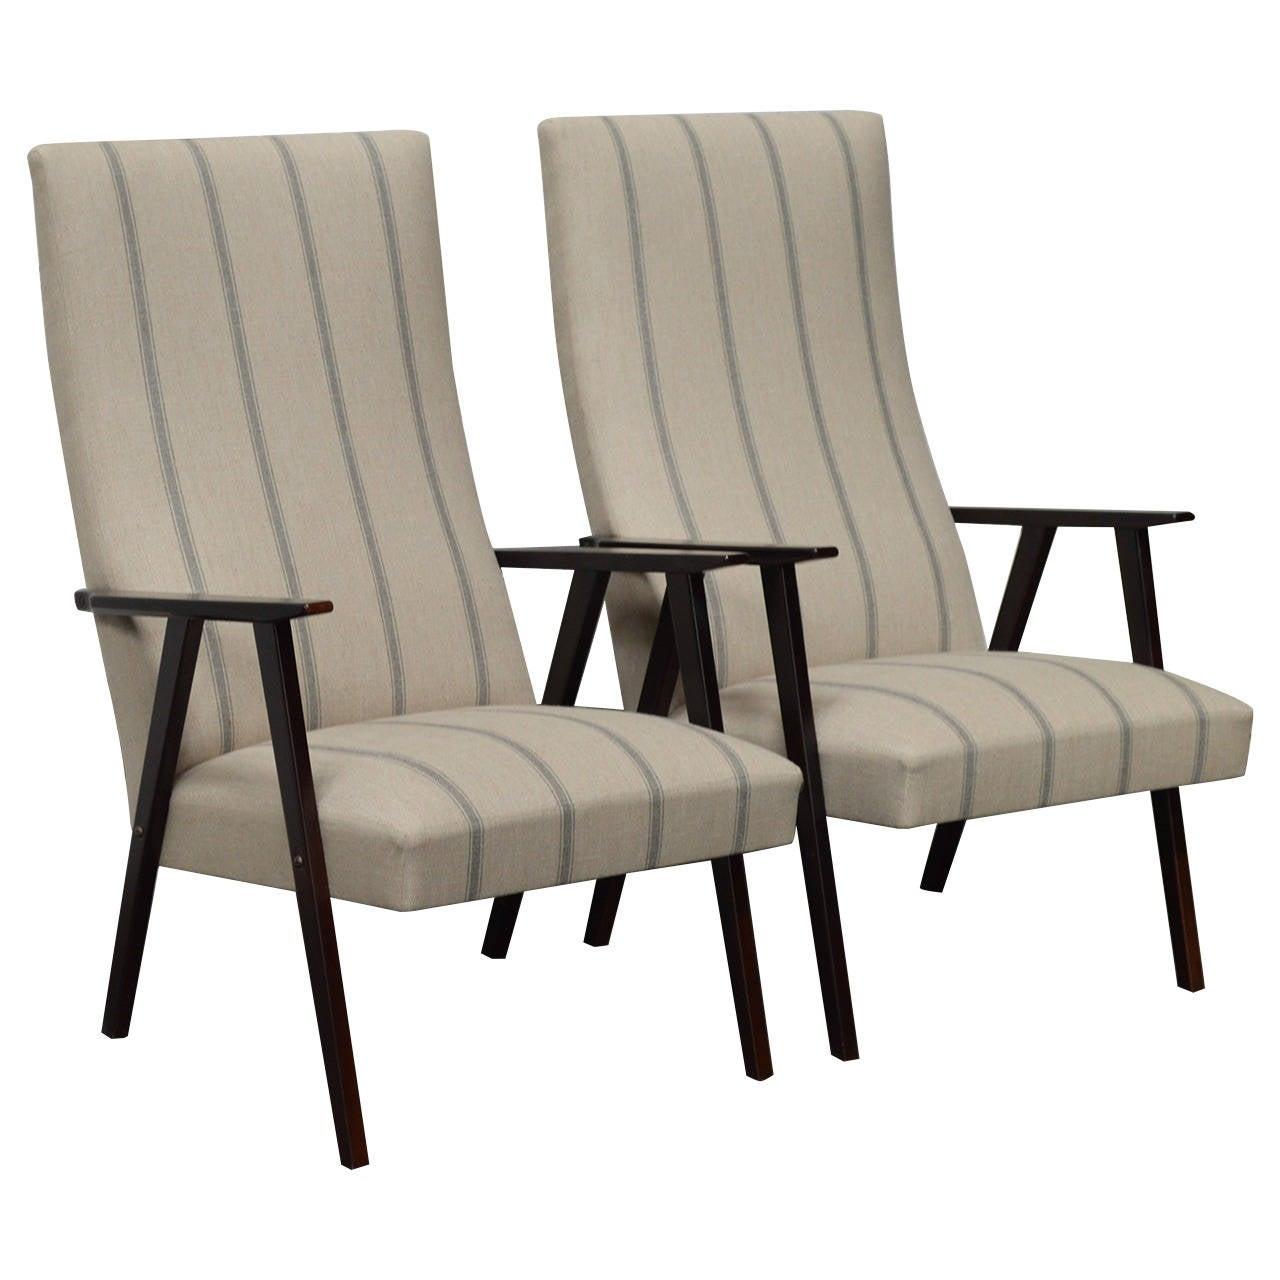 Pair of Swedish Mid-Century Modern High Back Lounge Armchairs